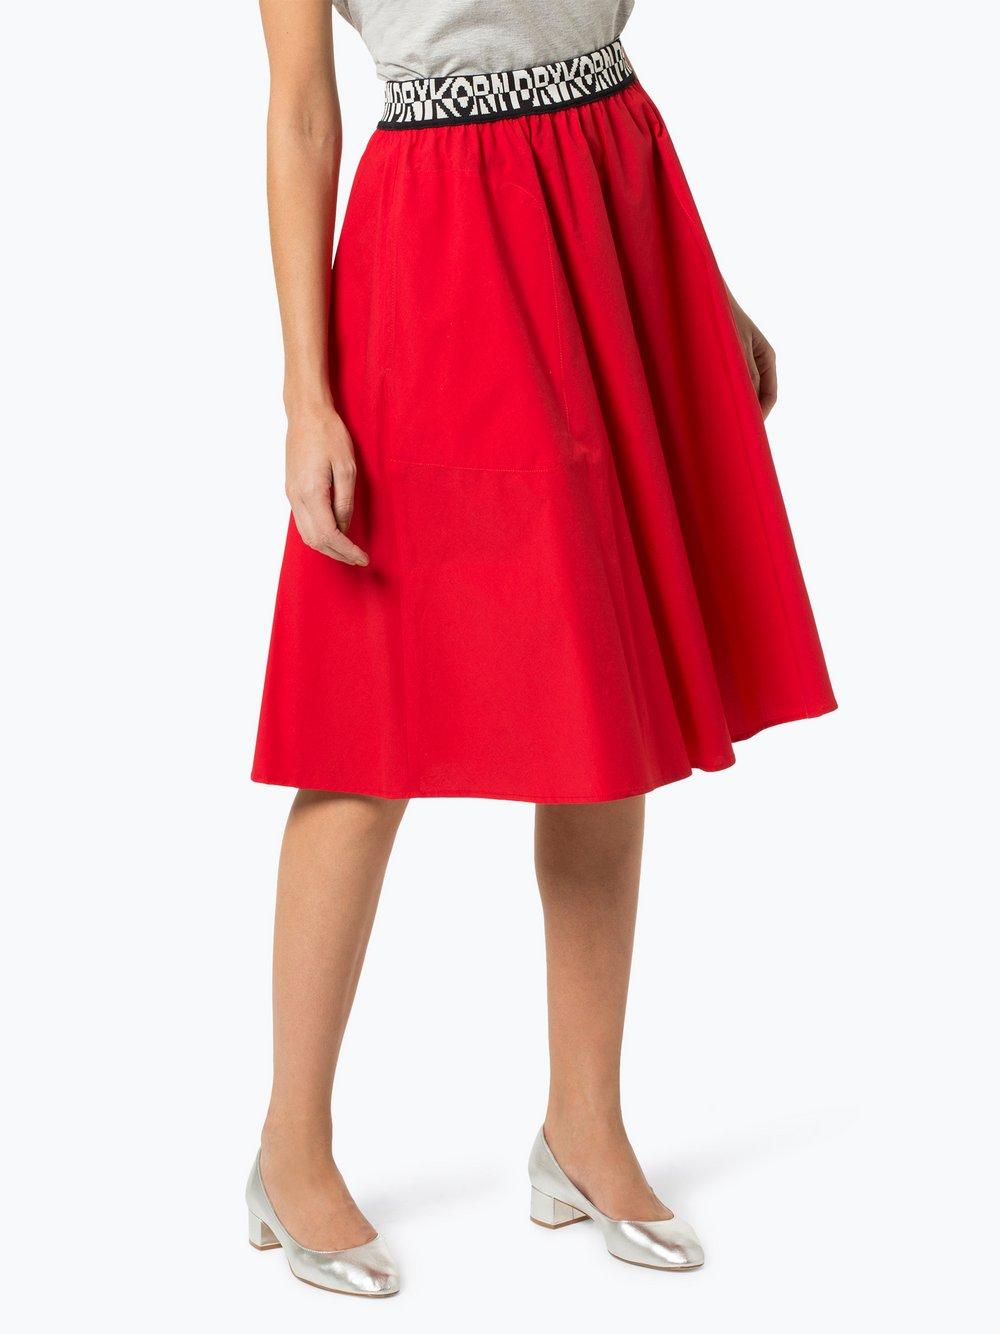 Drykorn - Spódnica damska – Carlotta, czerwony